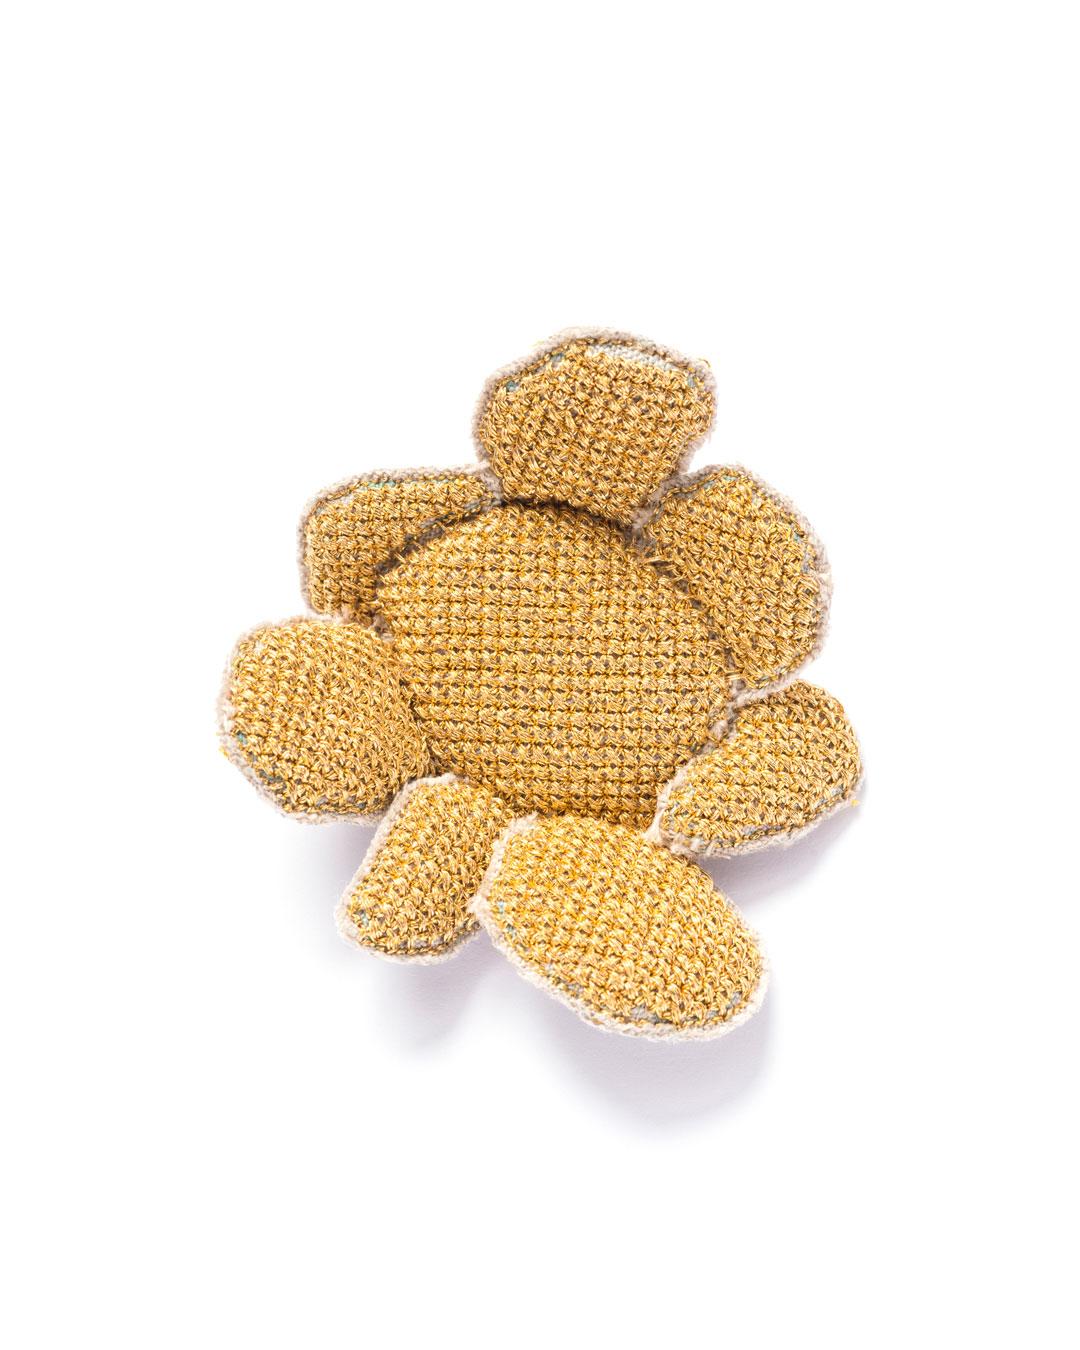 Carla Nuis, Golden Cuddles – Flower Brooch 4 (1/7), 2014, brooch; unbleached linen, 24ct gold kimono thread, linen flax fibres, 70 x 60 x 20 mm, €1250